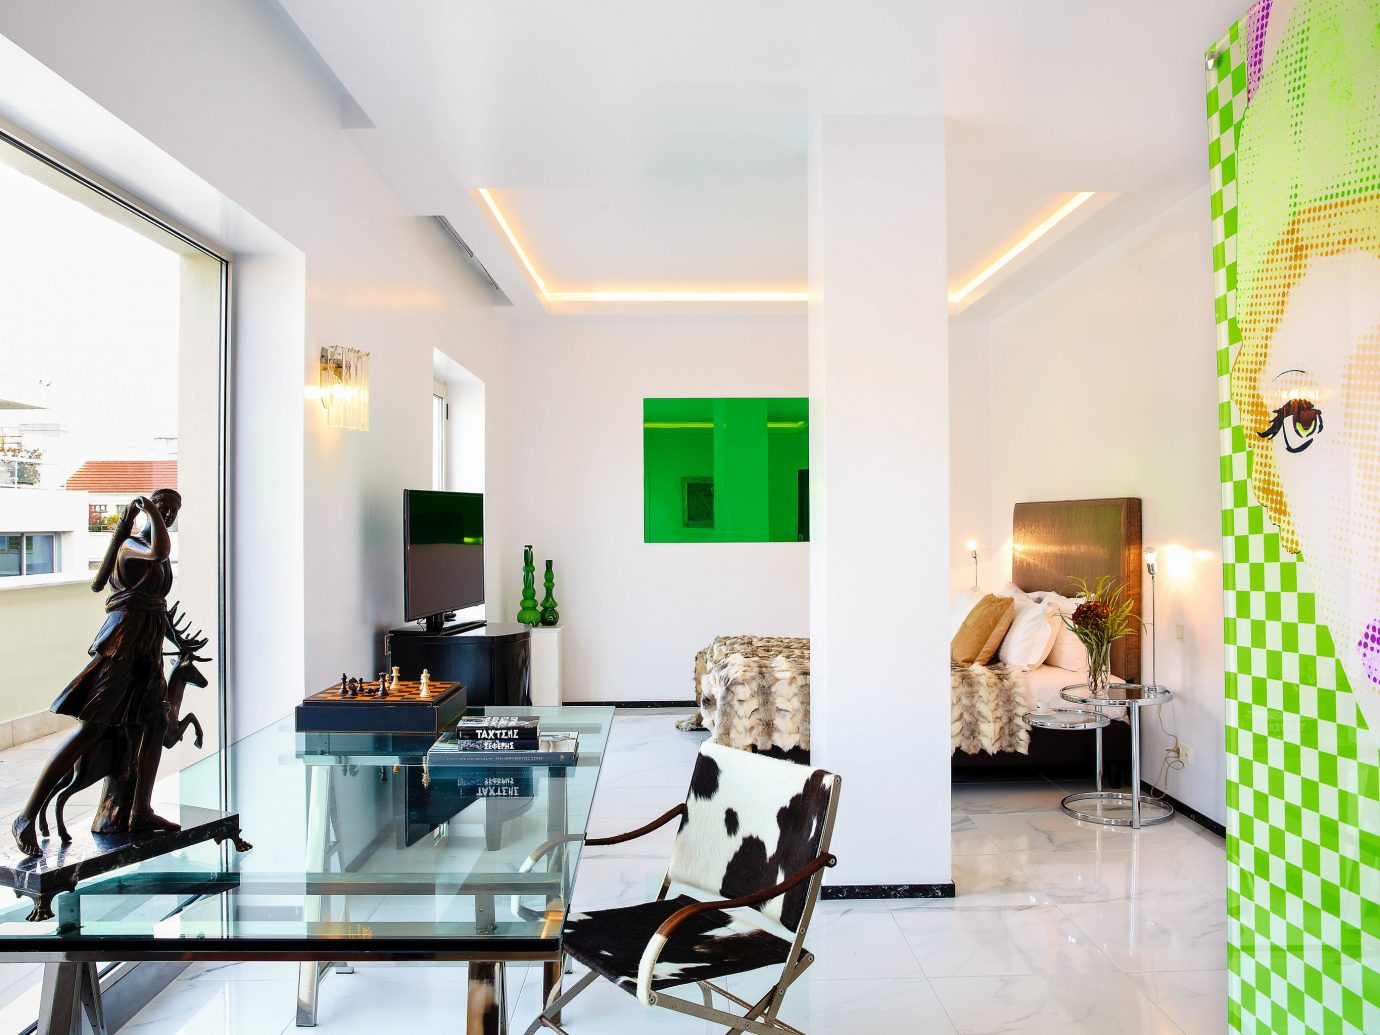 Trip Ideas indoor wall floor room interior design ceiling Lobby apartment home living room interior designer house furniture